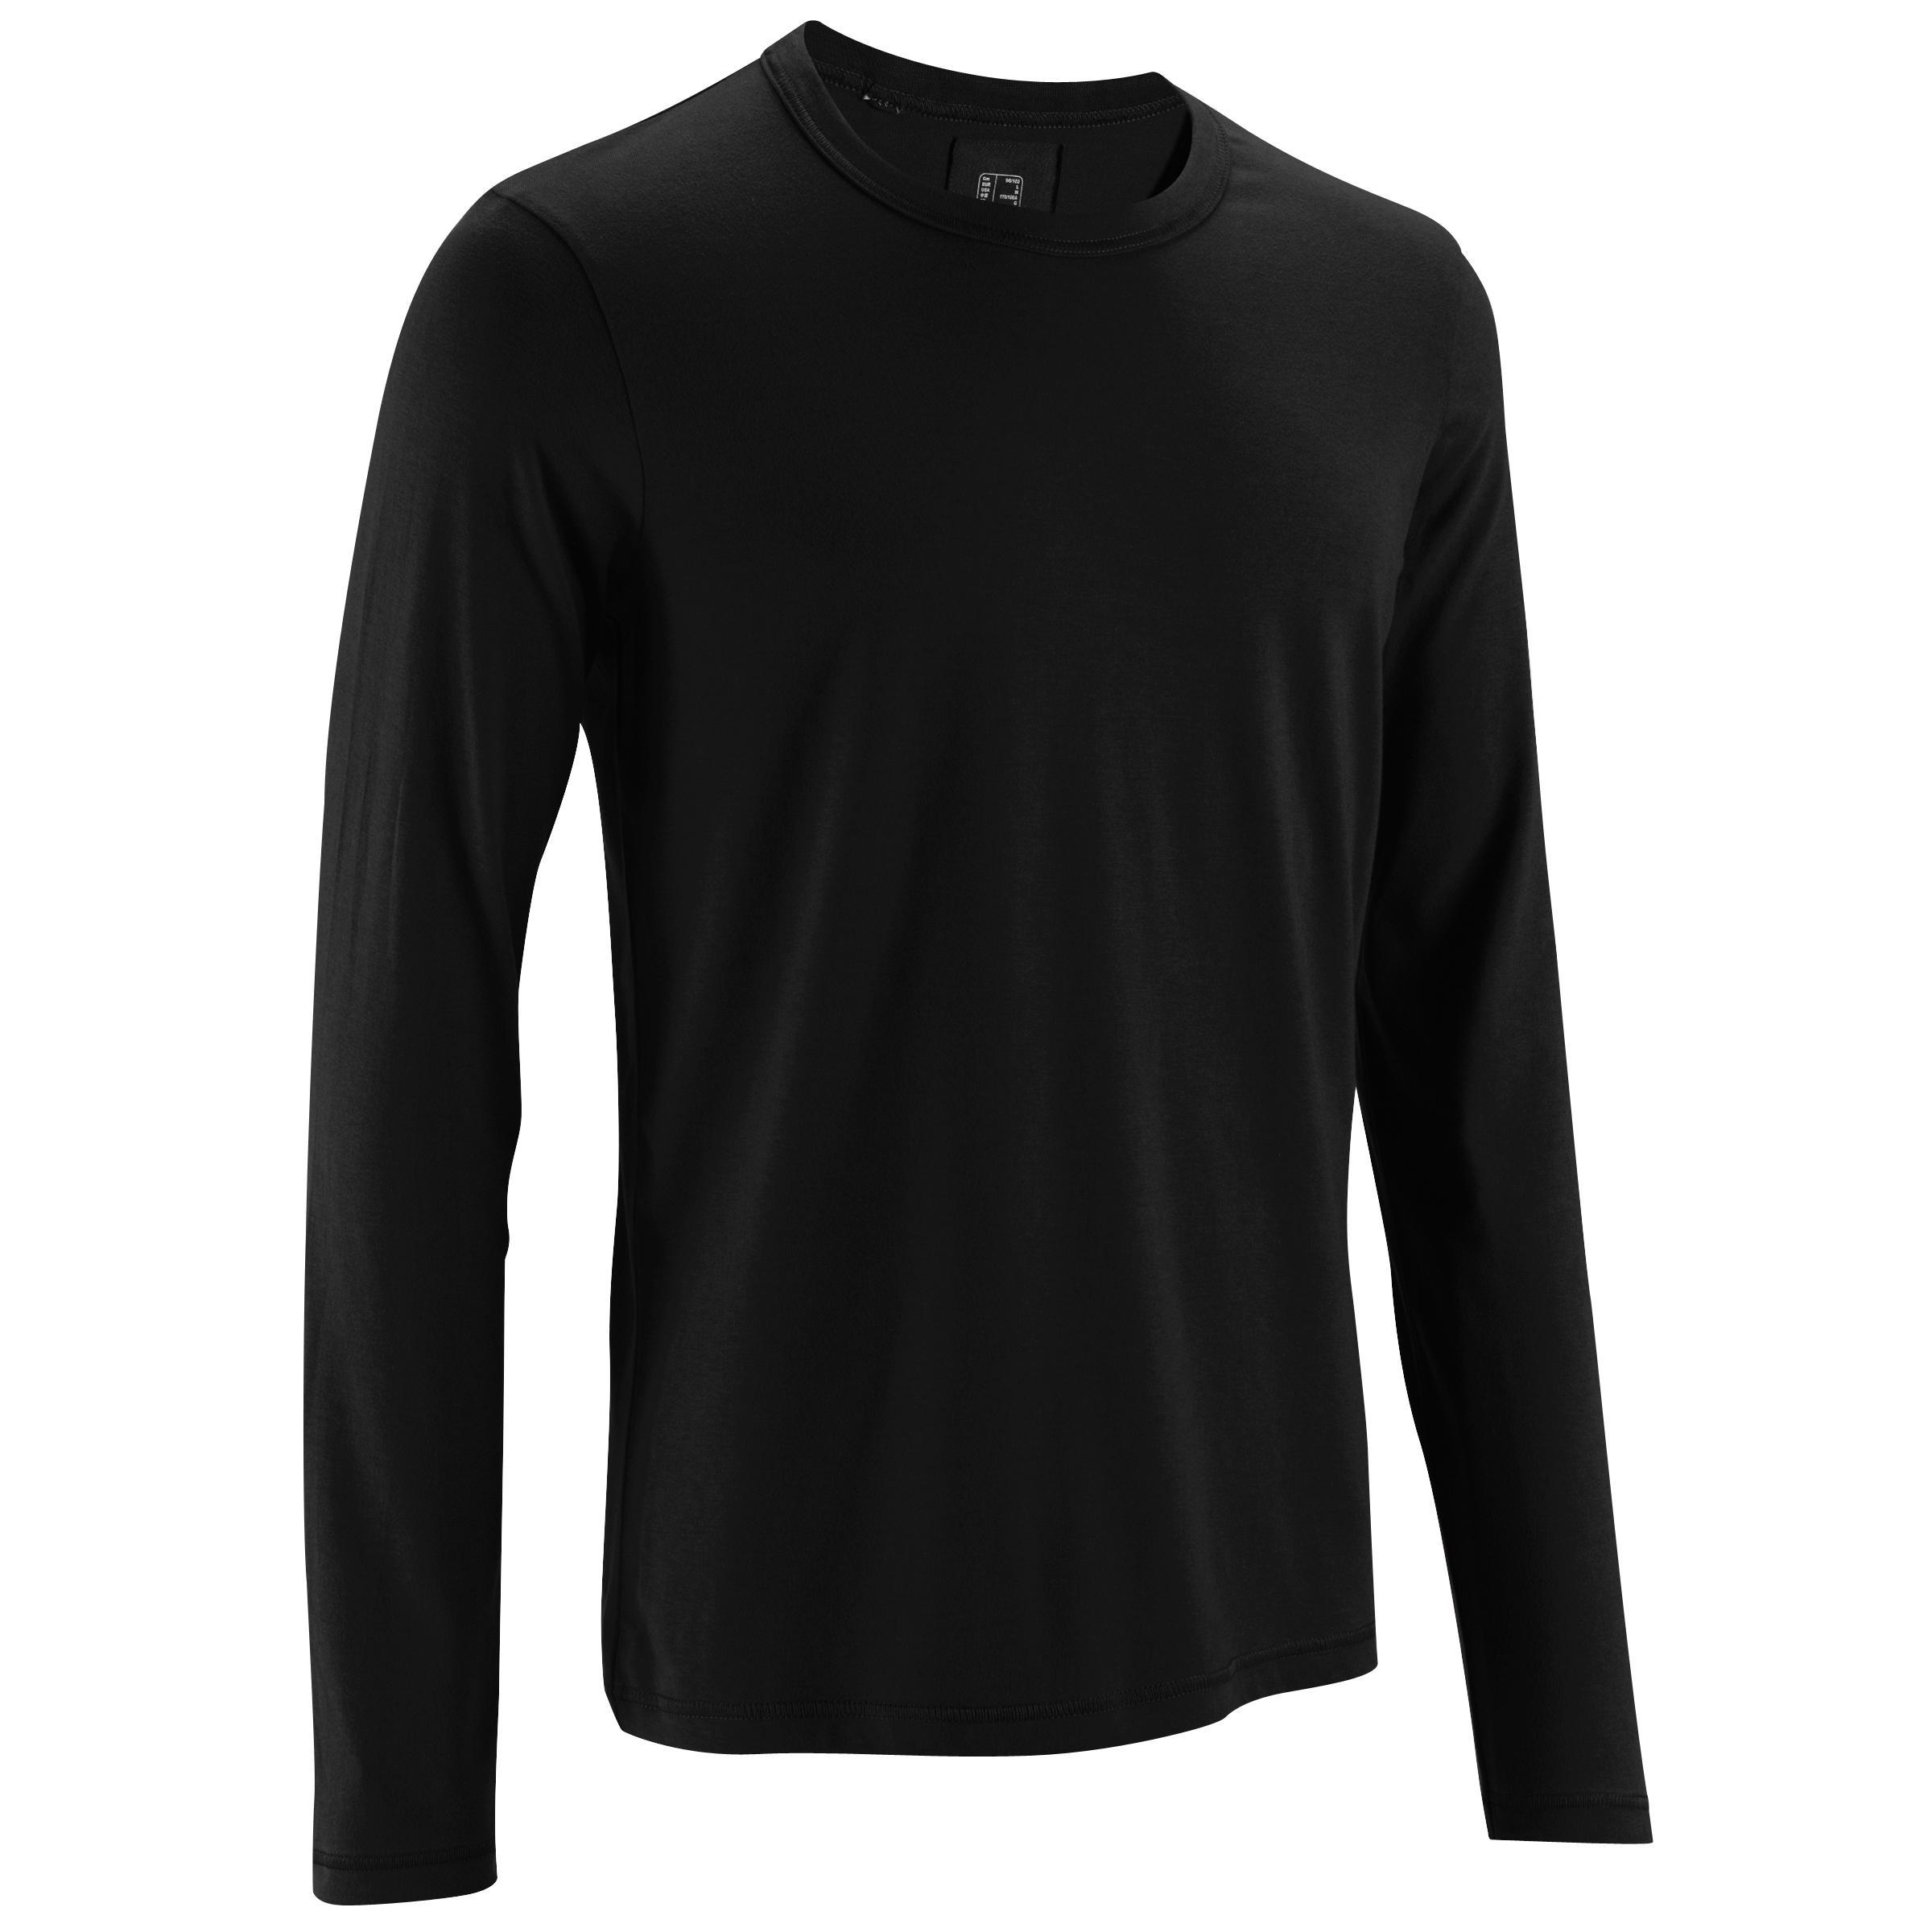 Domyos T-shirt 120 lange mouwen regular fit pilates en lichte gym heren